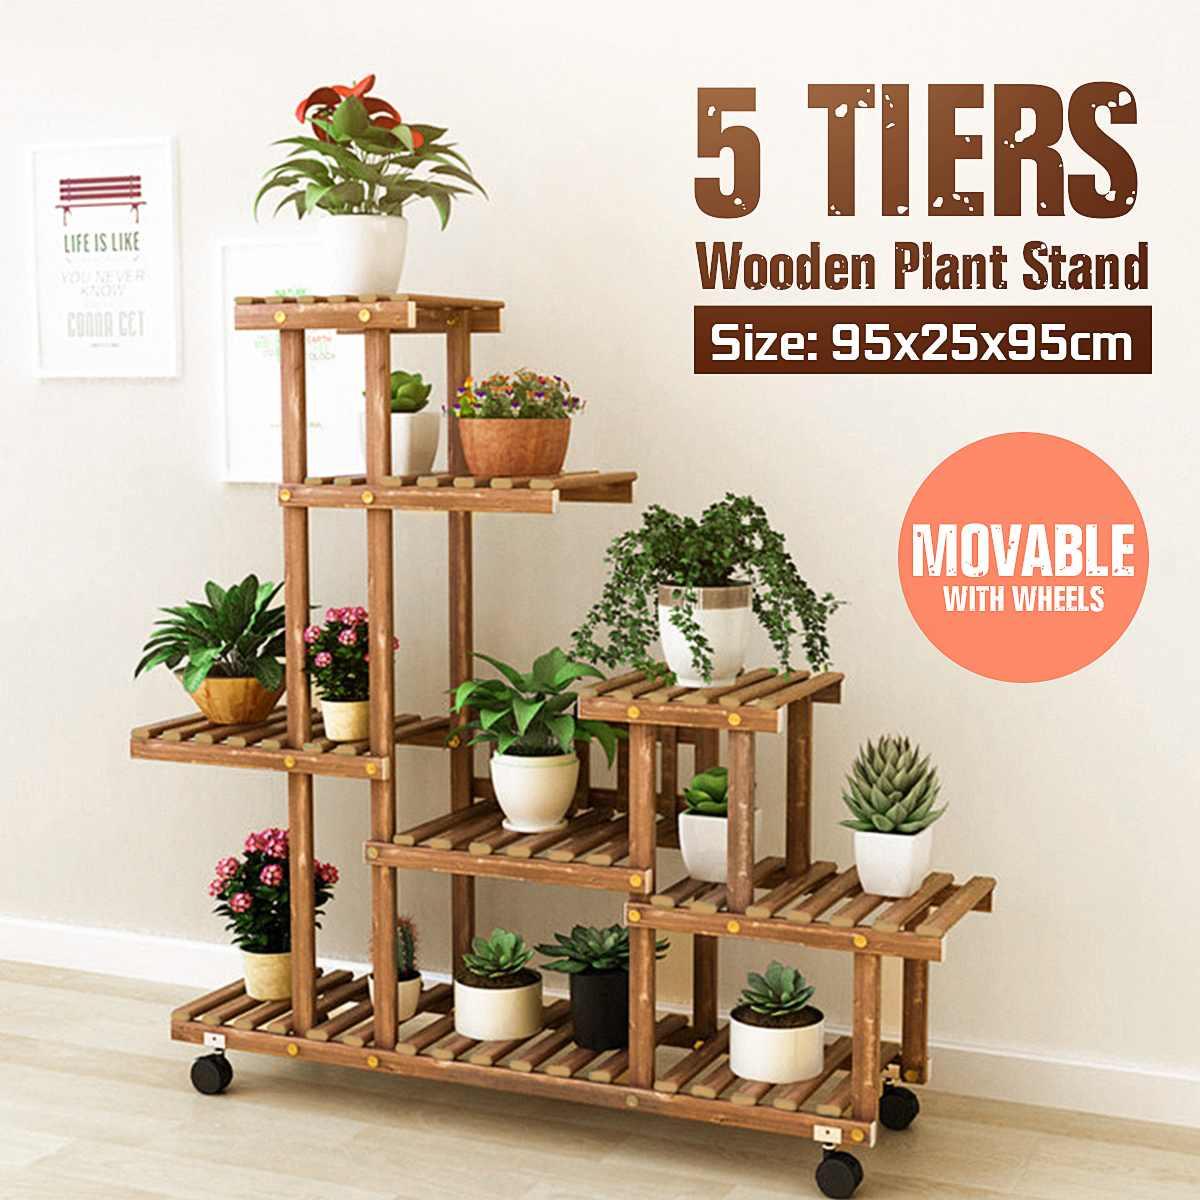 Estante de madera para flores de 5 niveles, soporte para plantas, soporte para múltiples Flores, estante de exhibición para bonsái, jardín, Patio, balcón, soportes de flores